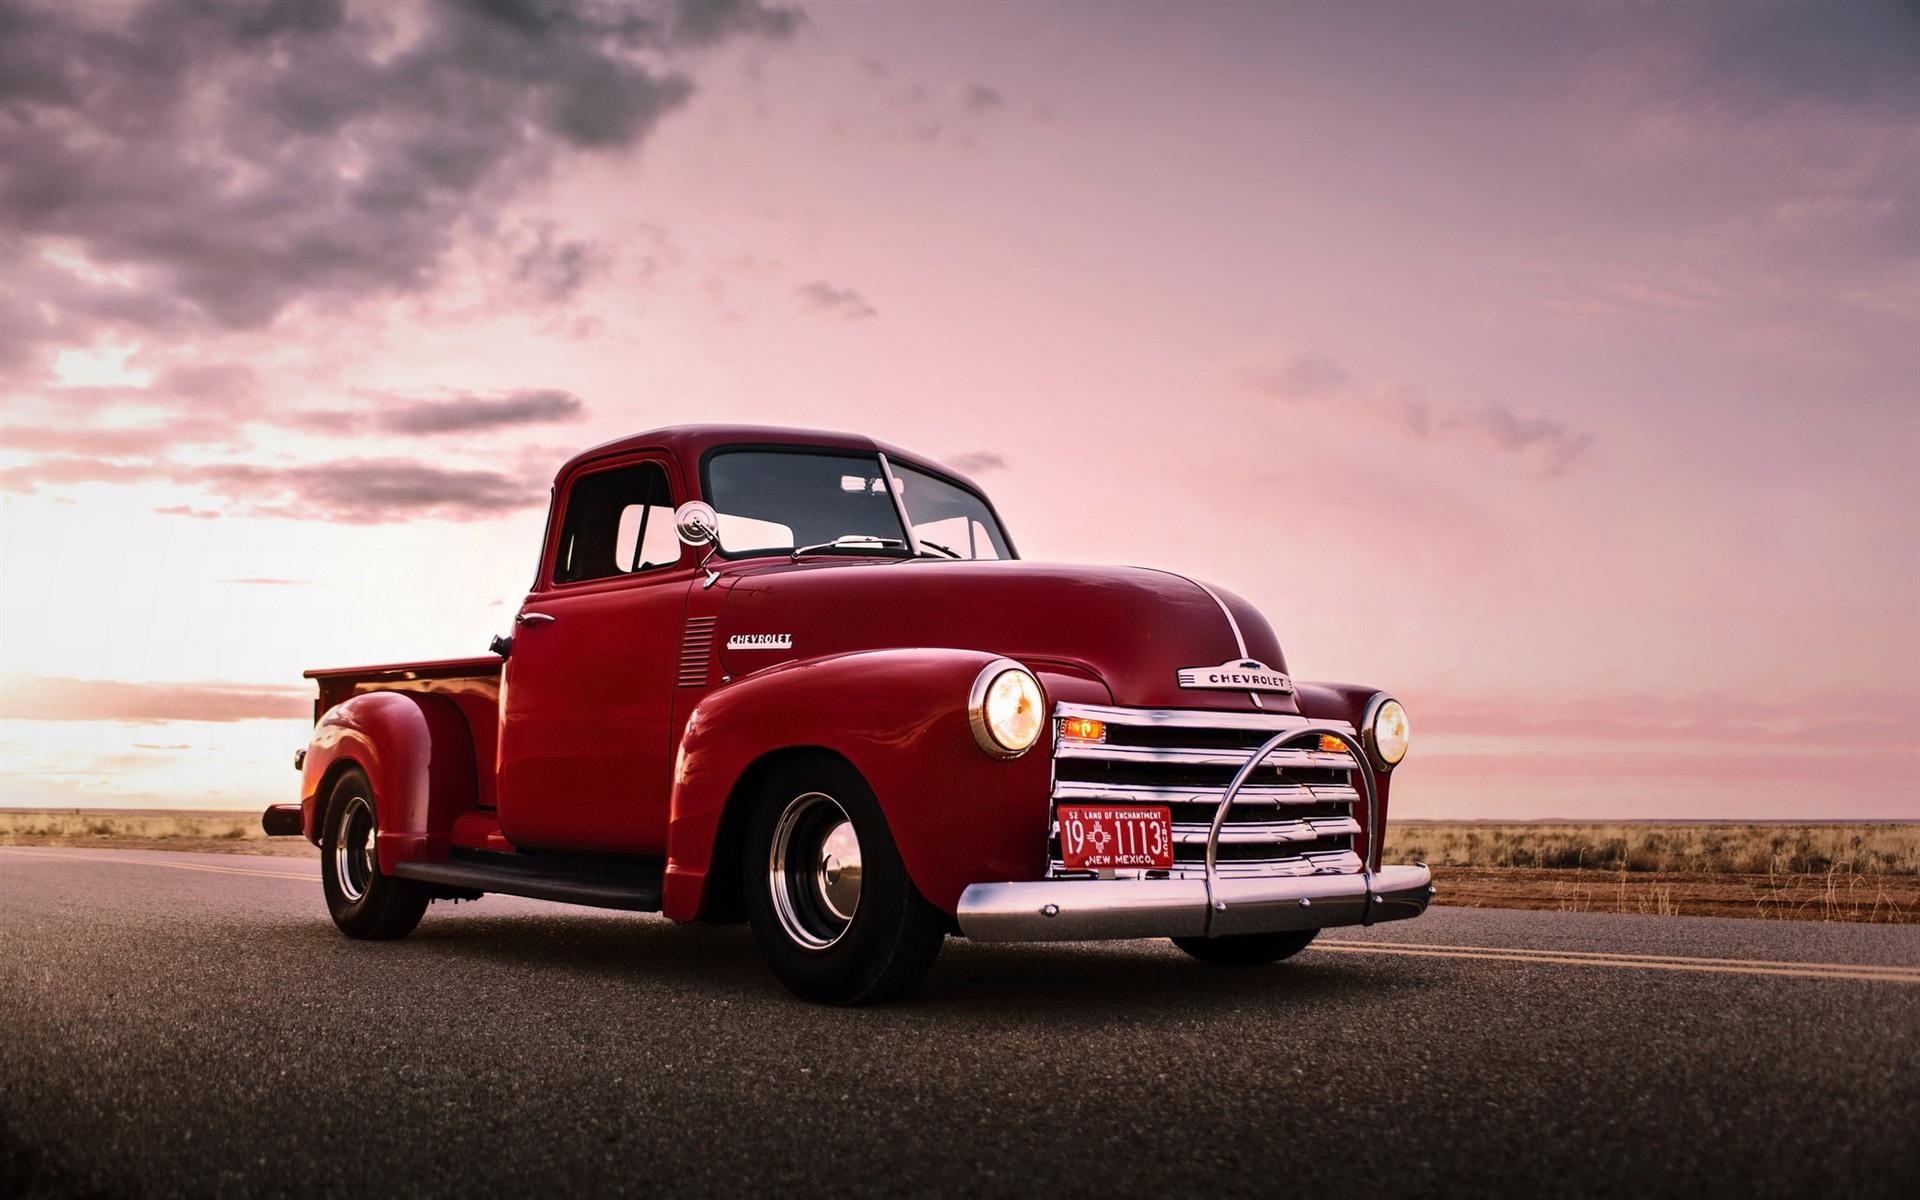 Chevrolet, red pickup, retro, old car Wallpaper | 1920x1200 resolution ...